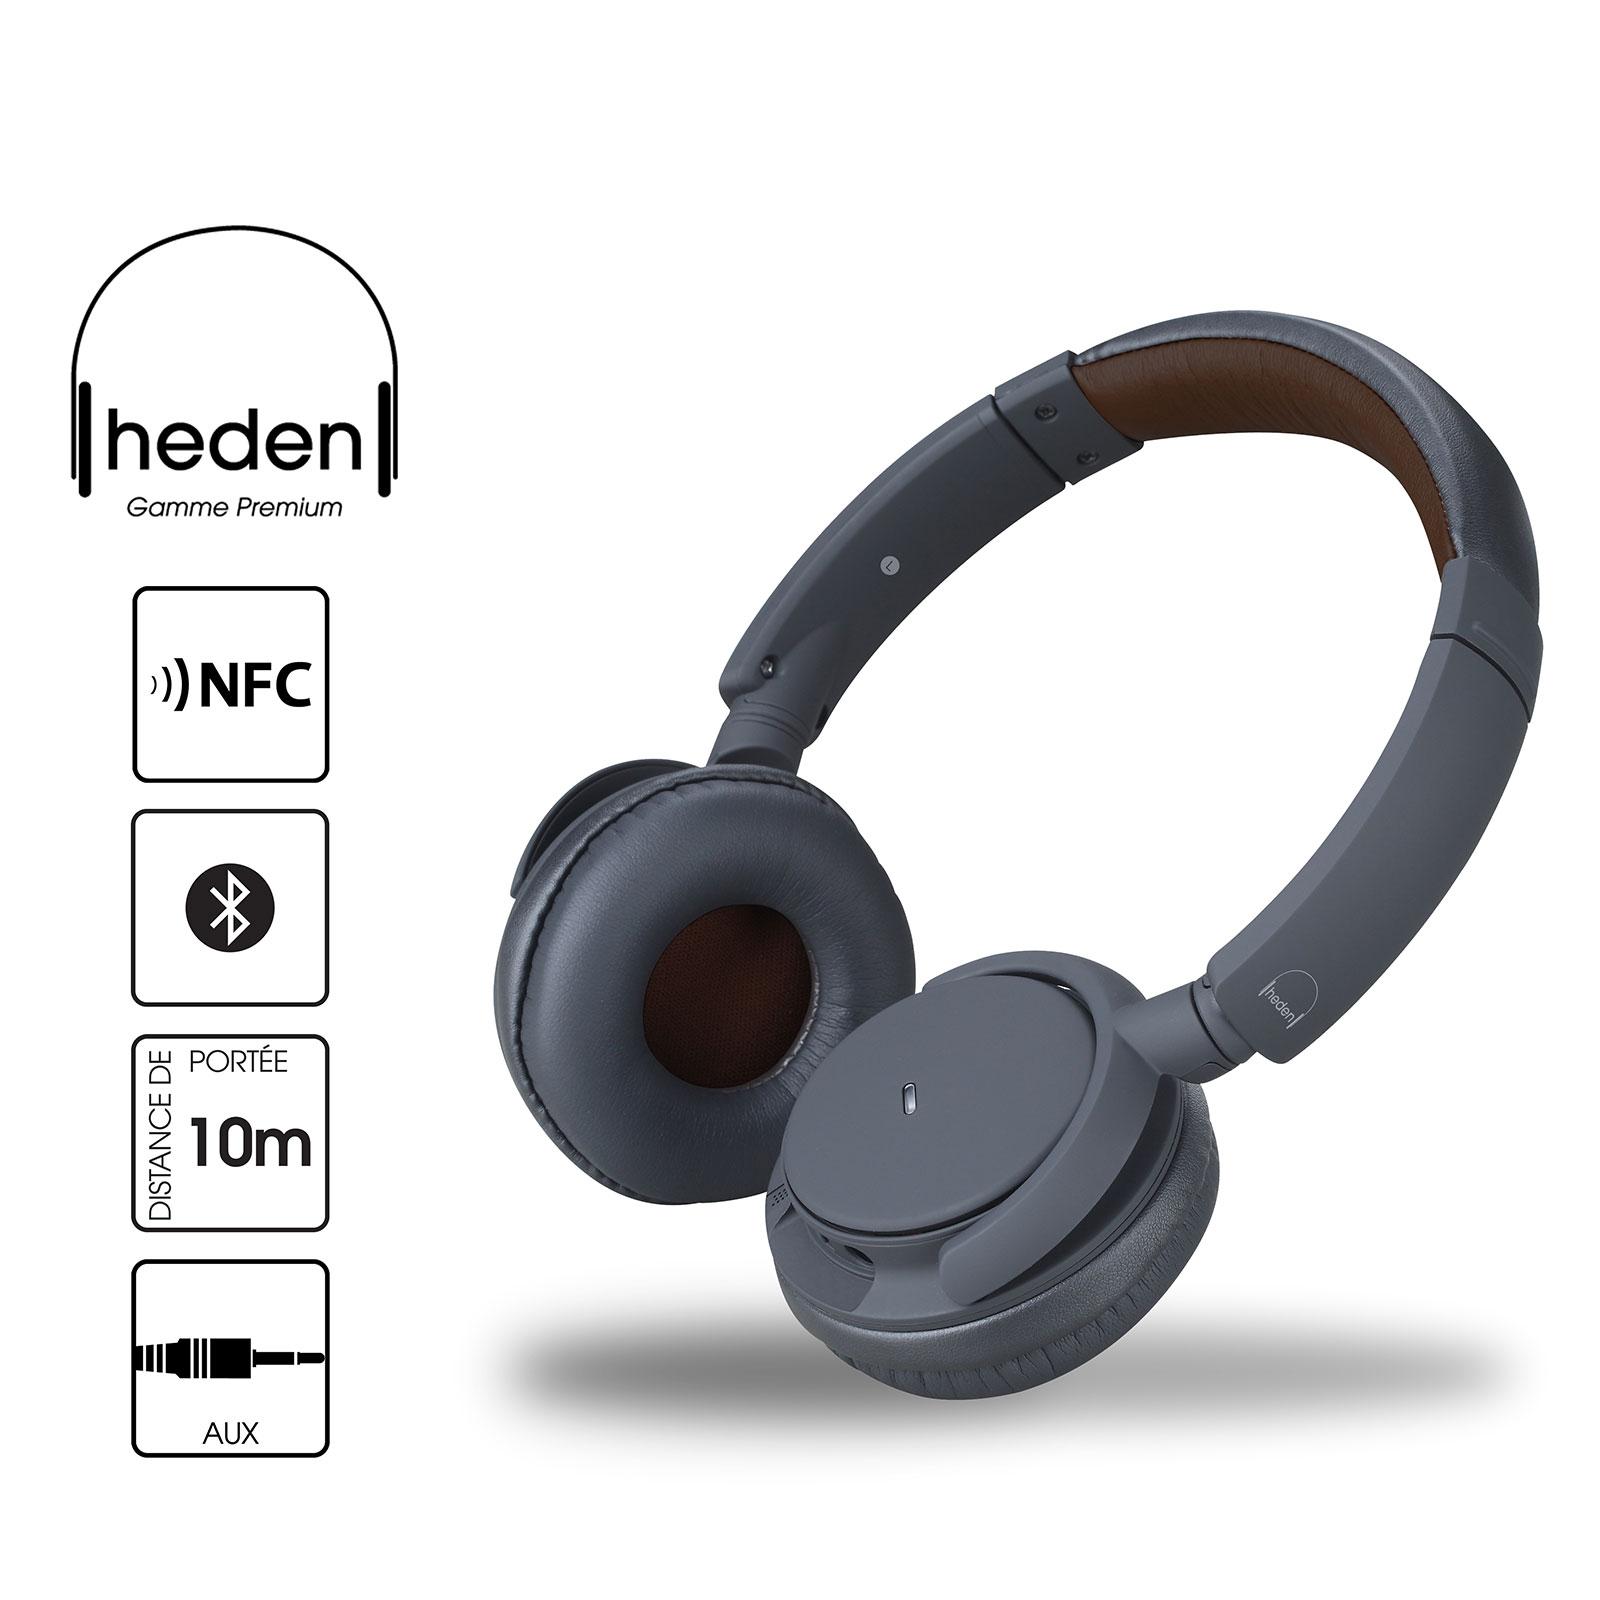 Casque Heden Premium Noir Casque circum-auriculaire Bluetooth NFC avec microphone